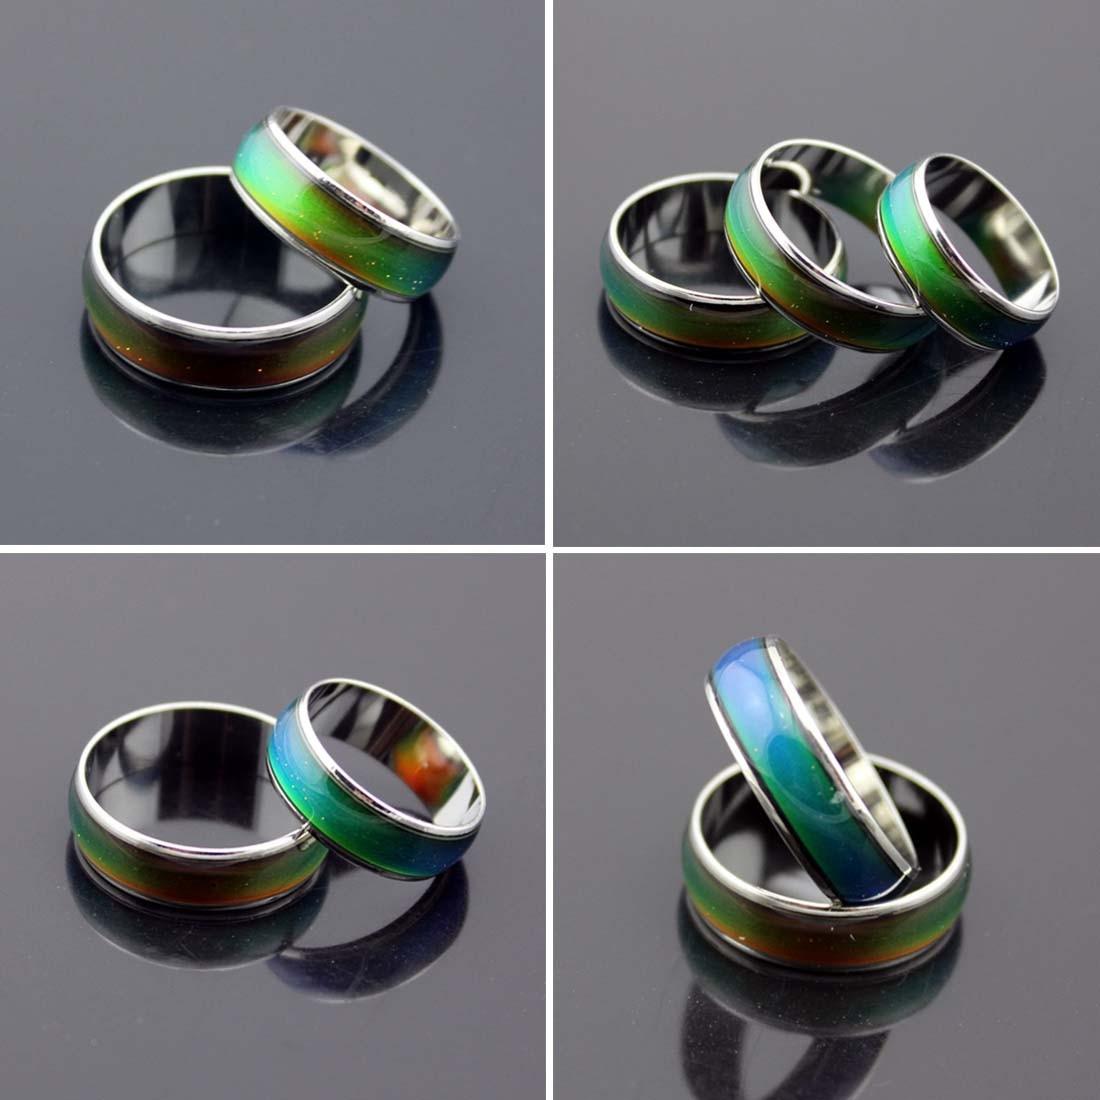 Acero inoxidable temperatura de Color sensible al anillo 6mm ancho anillo  cambia de Color humor anillos 13e68a11a48